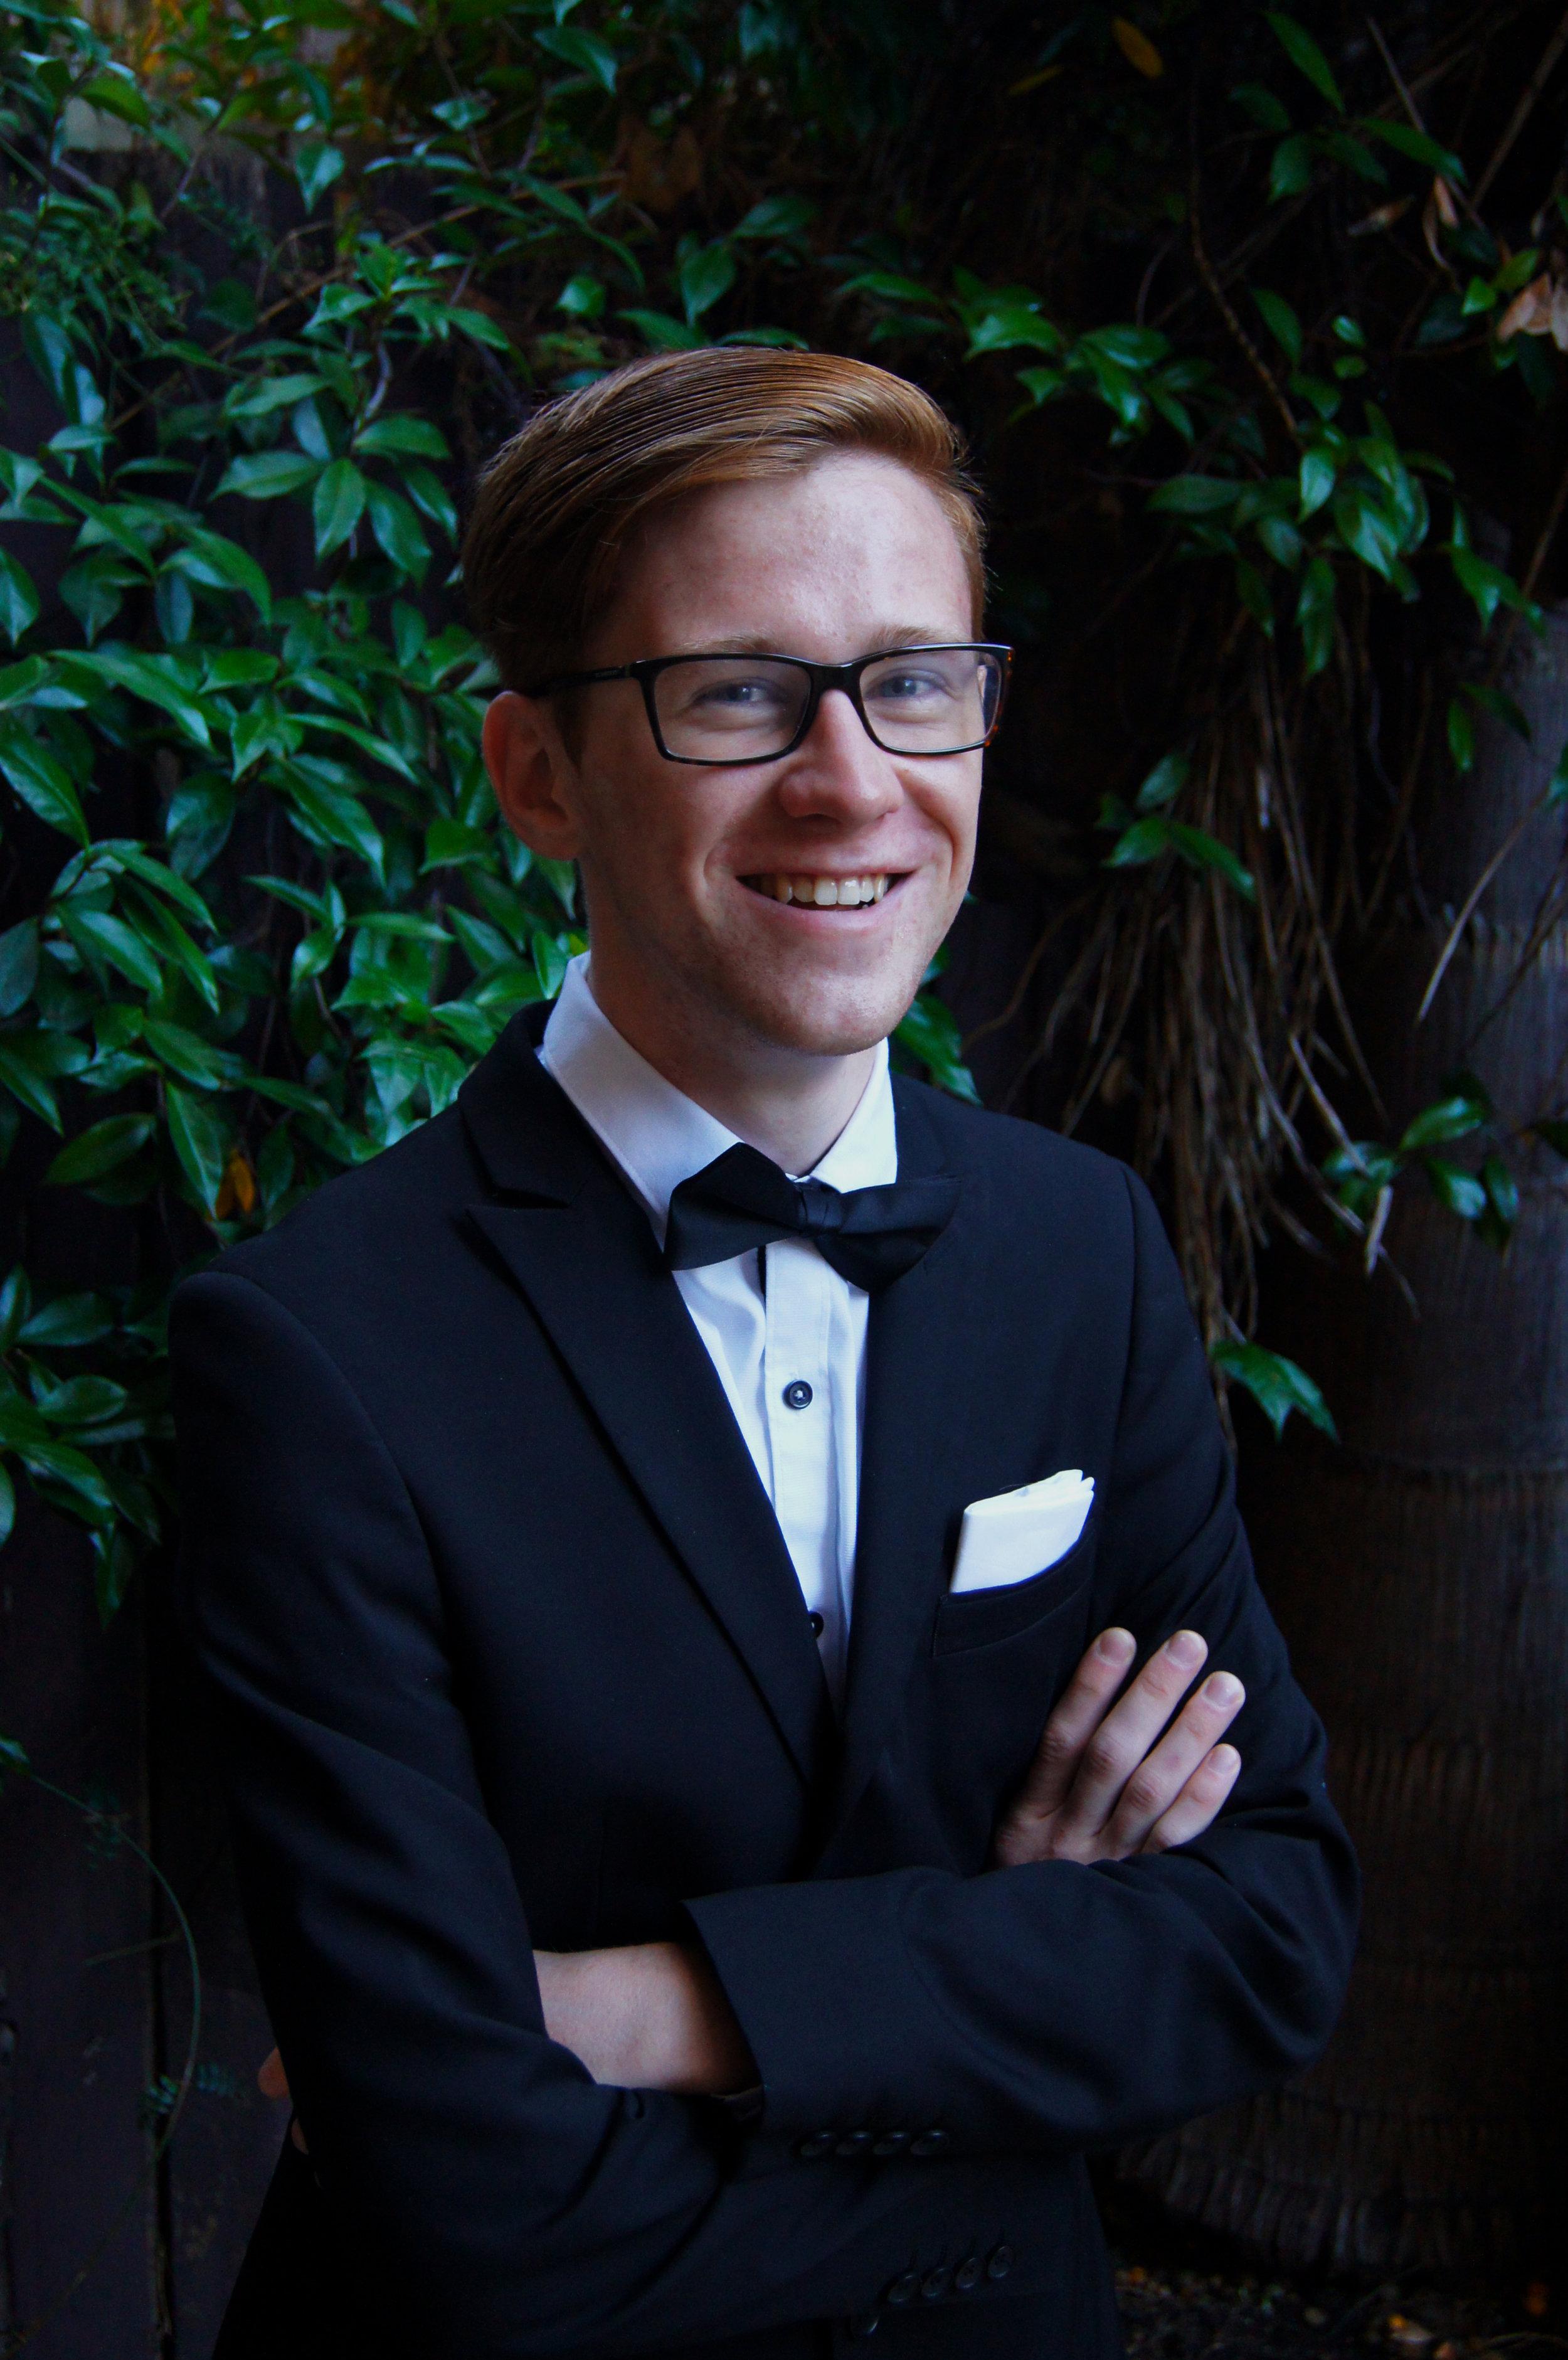 Andrew Groch, 2016 Alumni